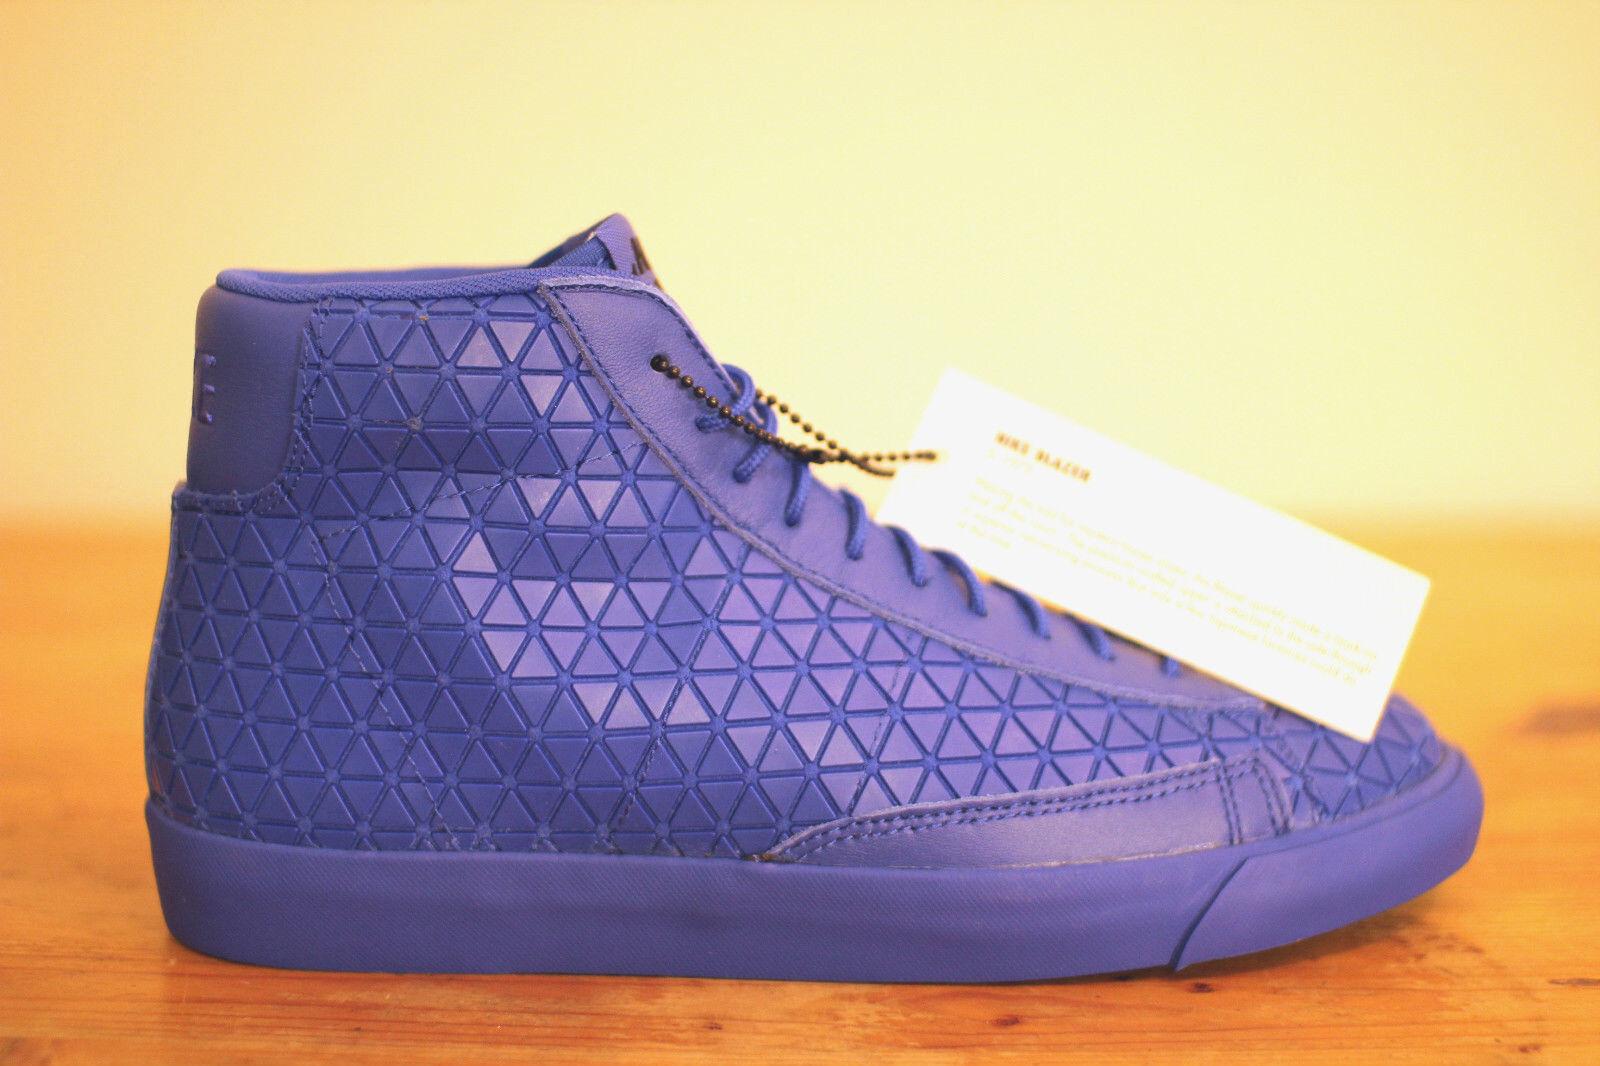 Nike Dunk Retro Low Para Hombre Zapatillas Negro Talla UK 12